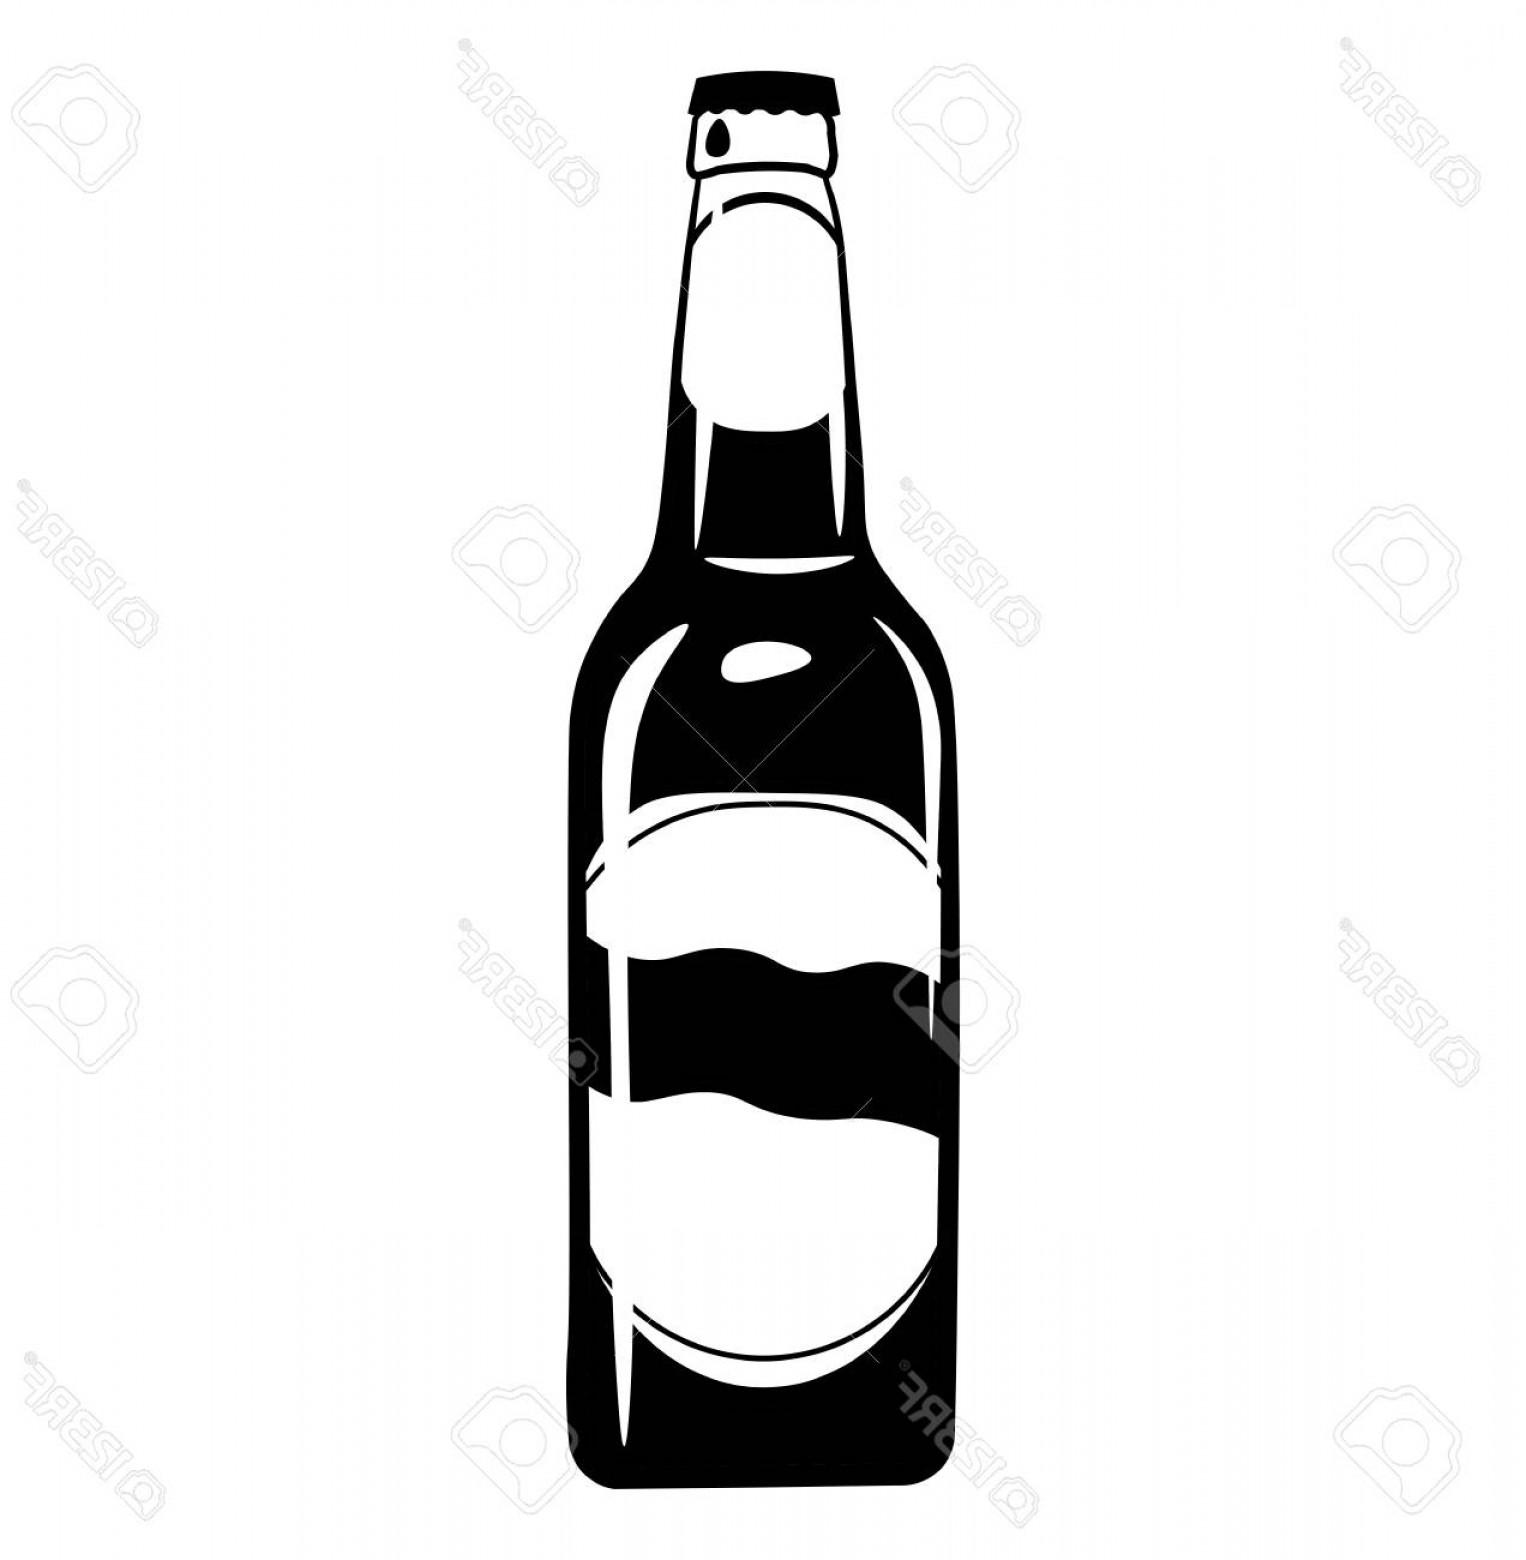 1526x1560 Photostock Vector Beer Bottle Icon Alcohol Drink Craft Beer Vector